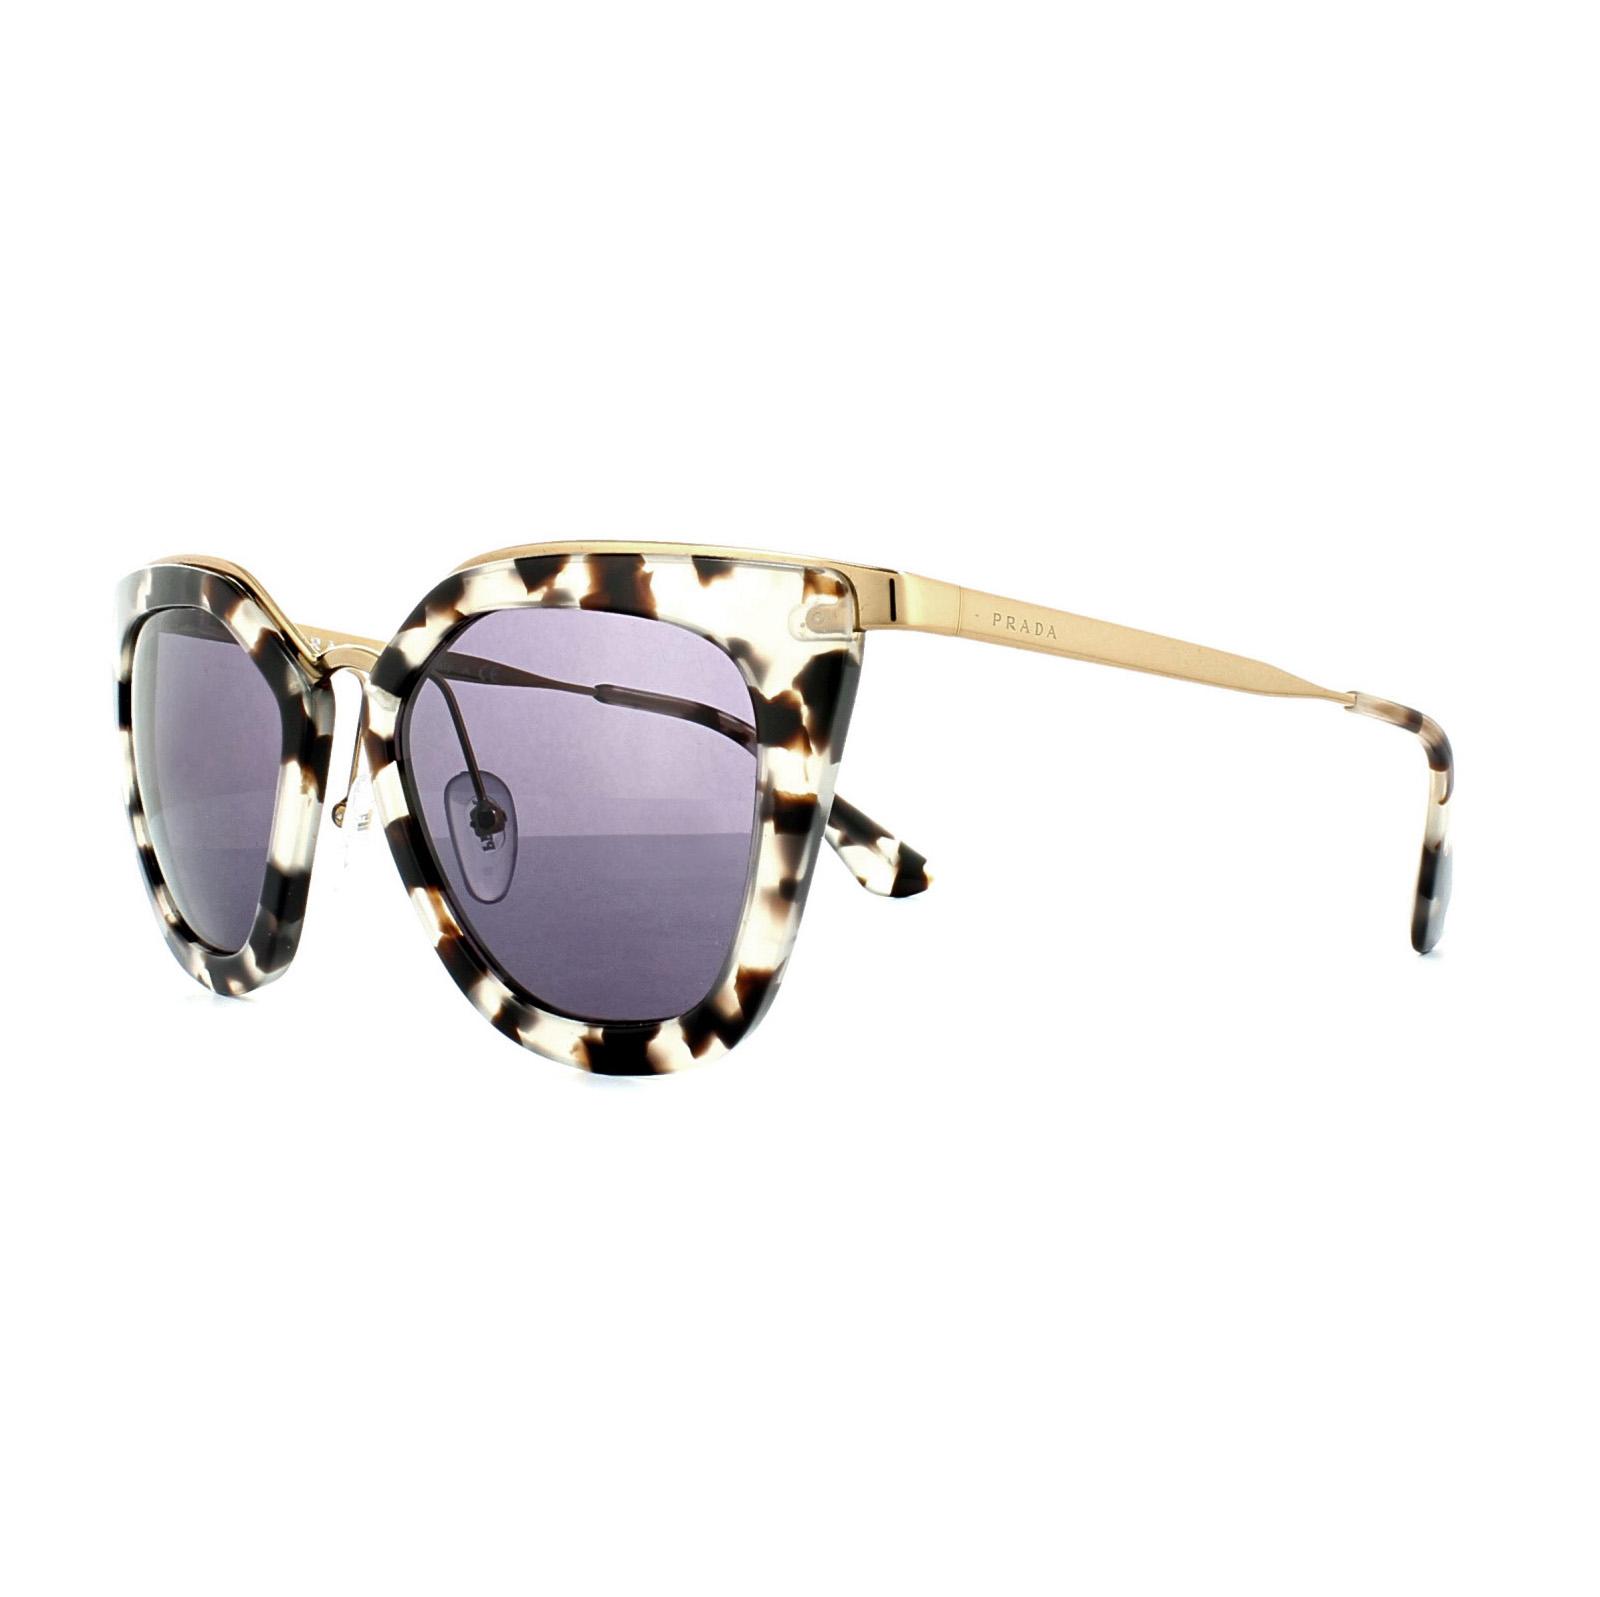 da63ef2e697c ... best prada cinema evolution 53ss sunglasses 98831 b0015